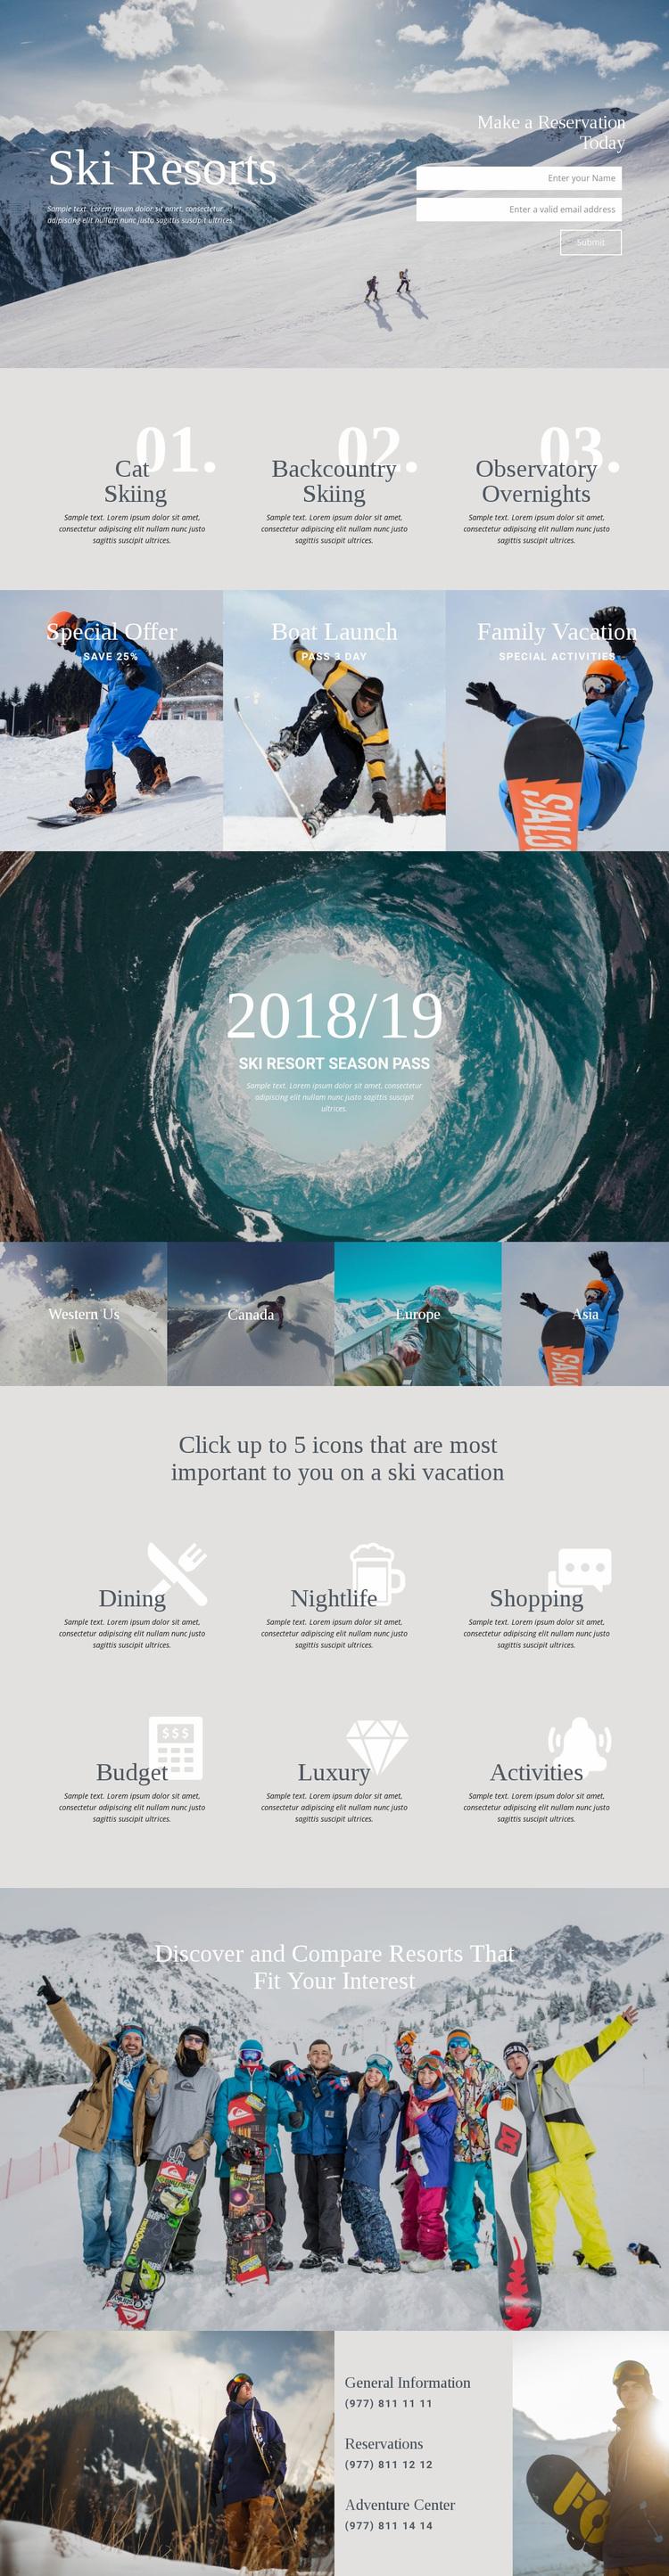 Ski Resorts Website Design